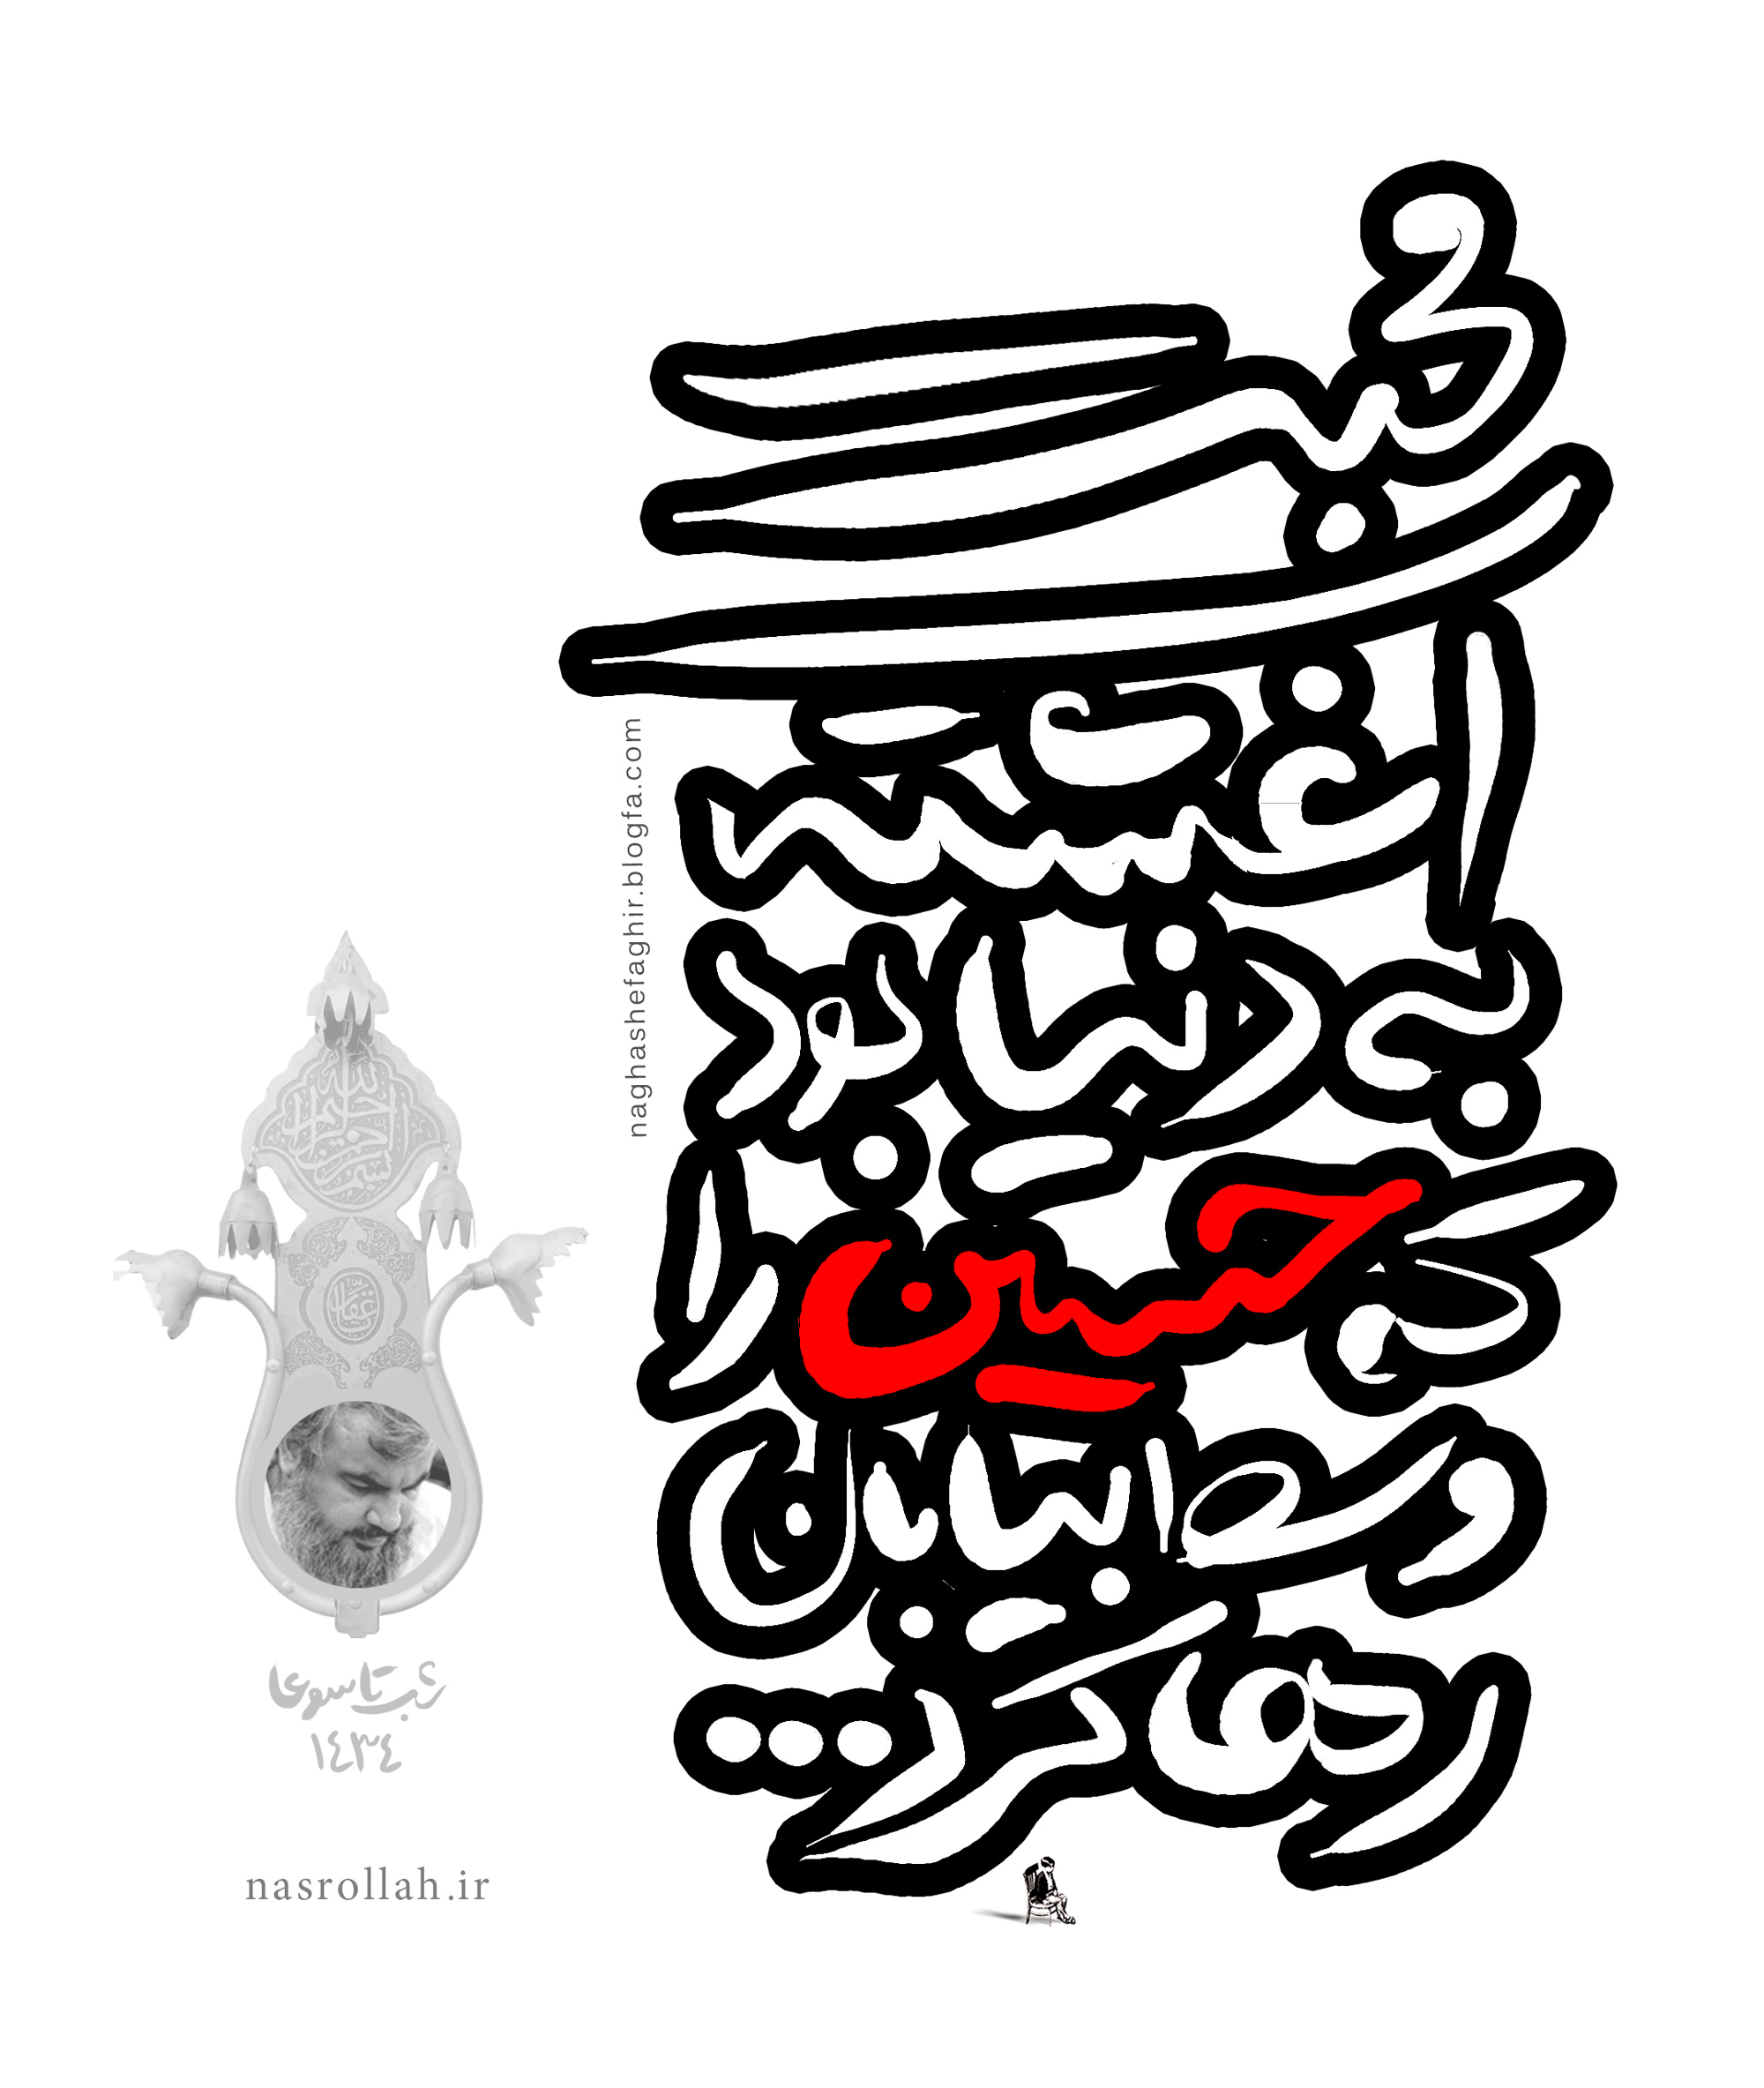 http://naqhashefaghir.persiangig.com/image/9/112-Hossain-High.jpg